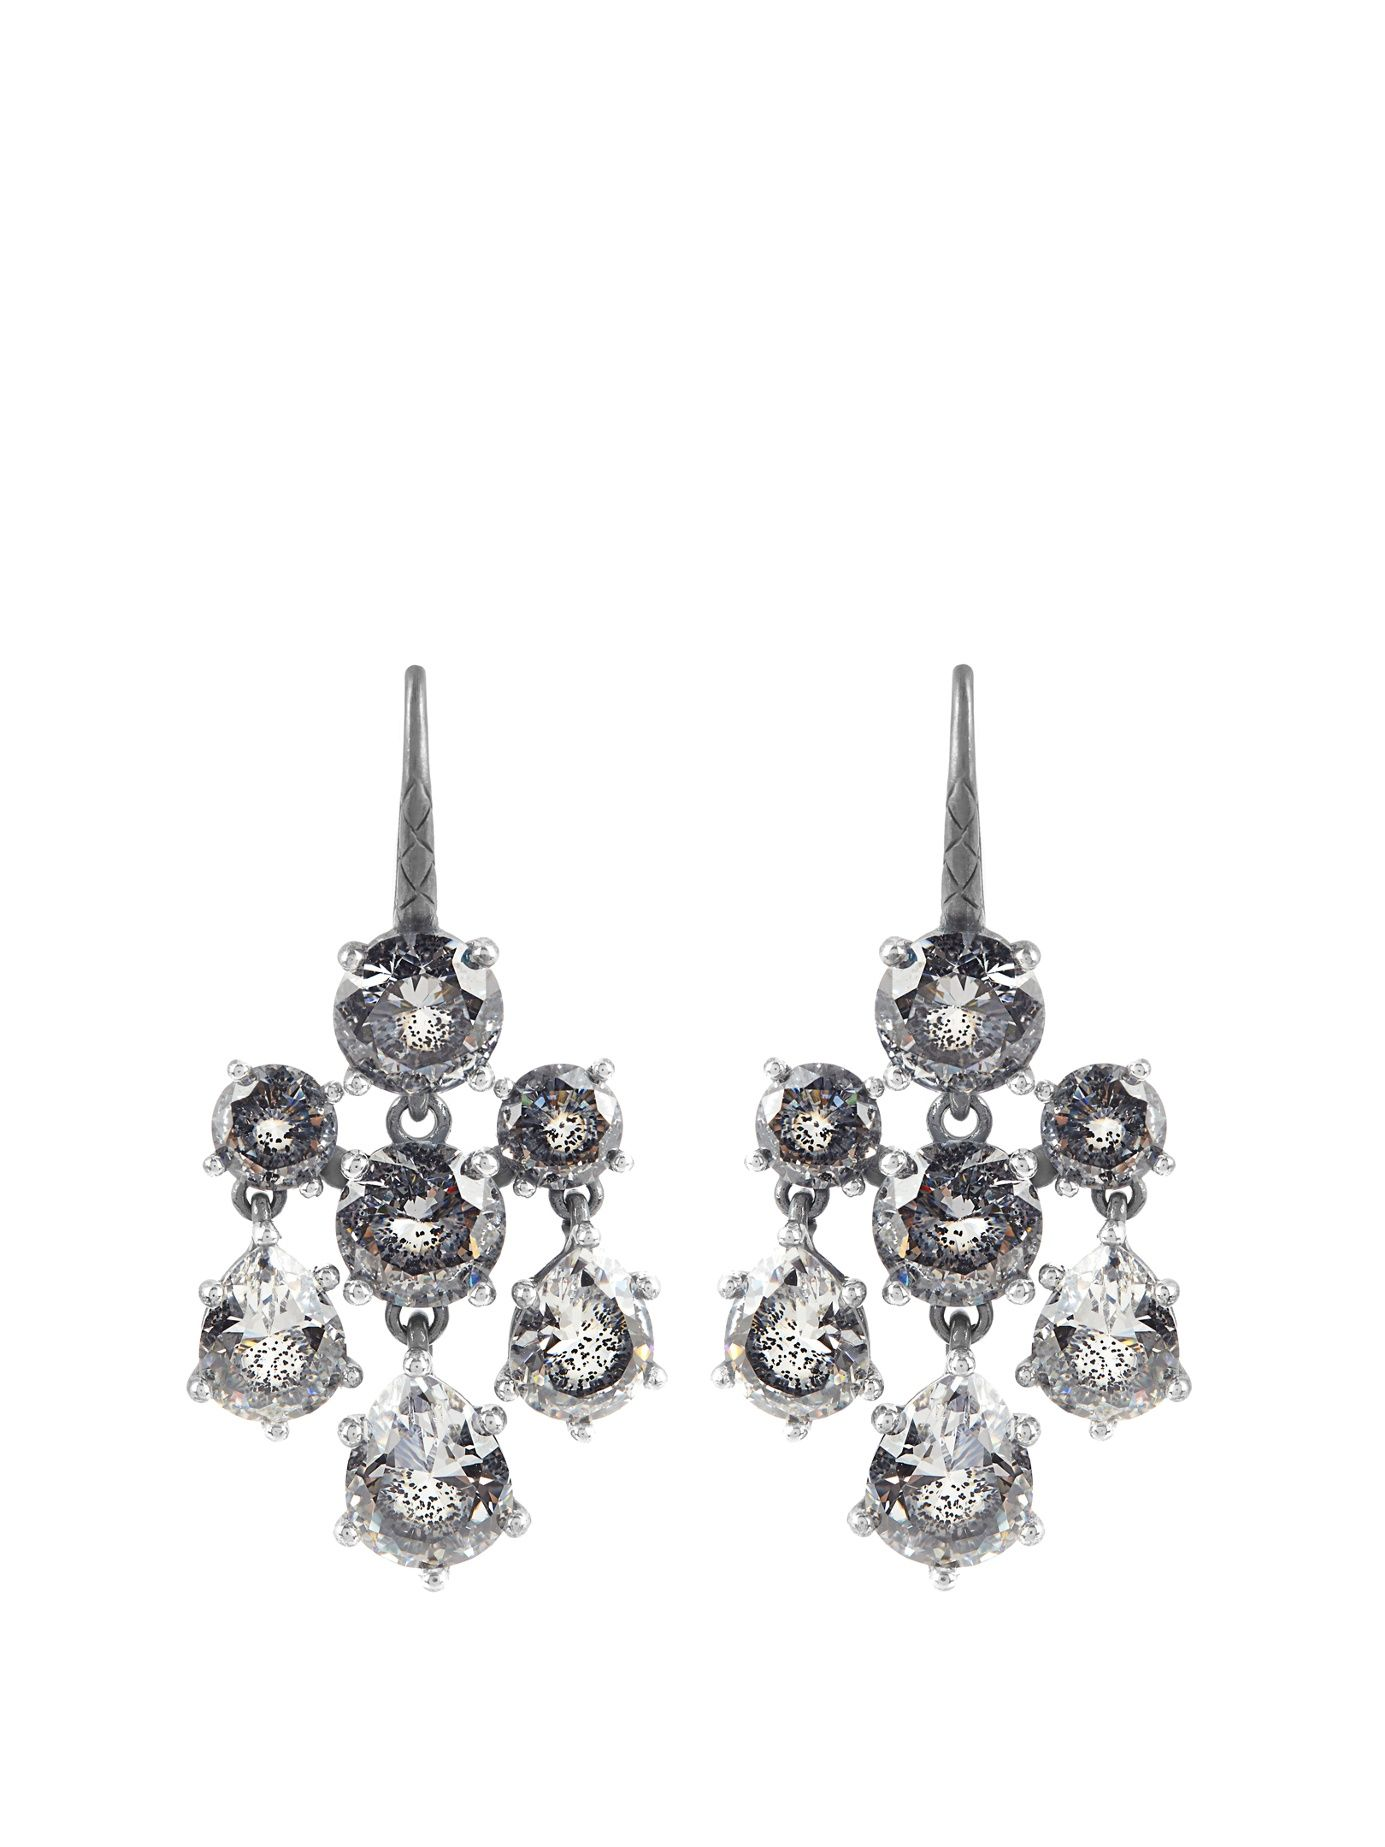 Cubiczirconia And Silver Chandelier Earrings  Bottega Veneta   Matchesfashion Uk